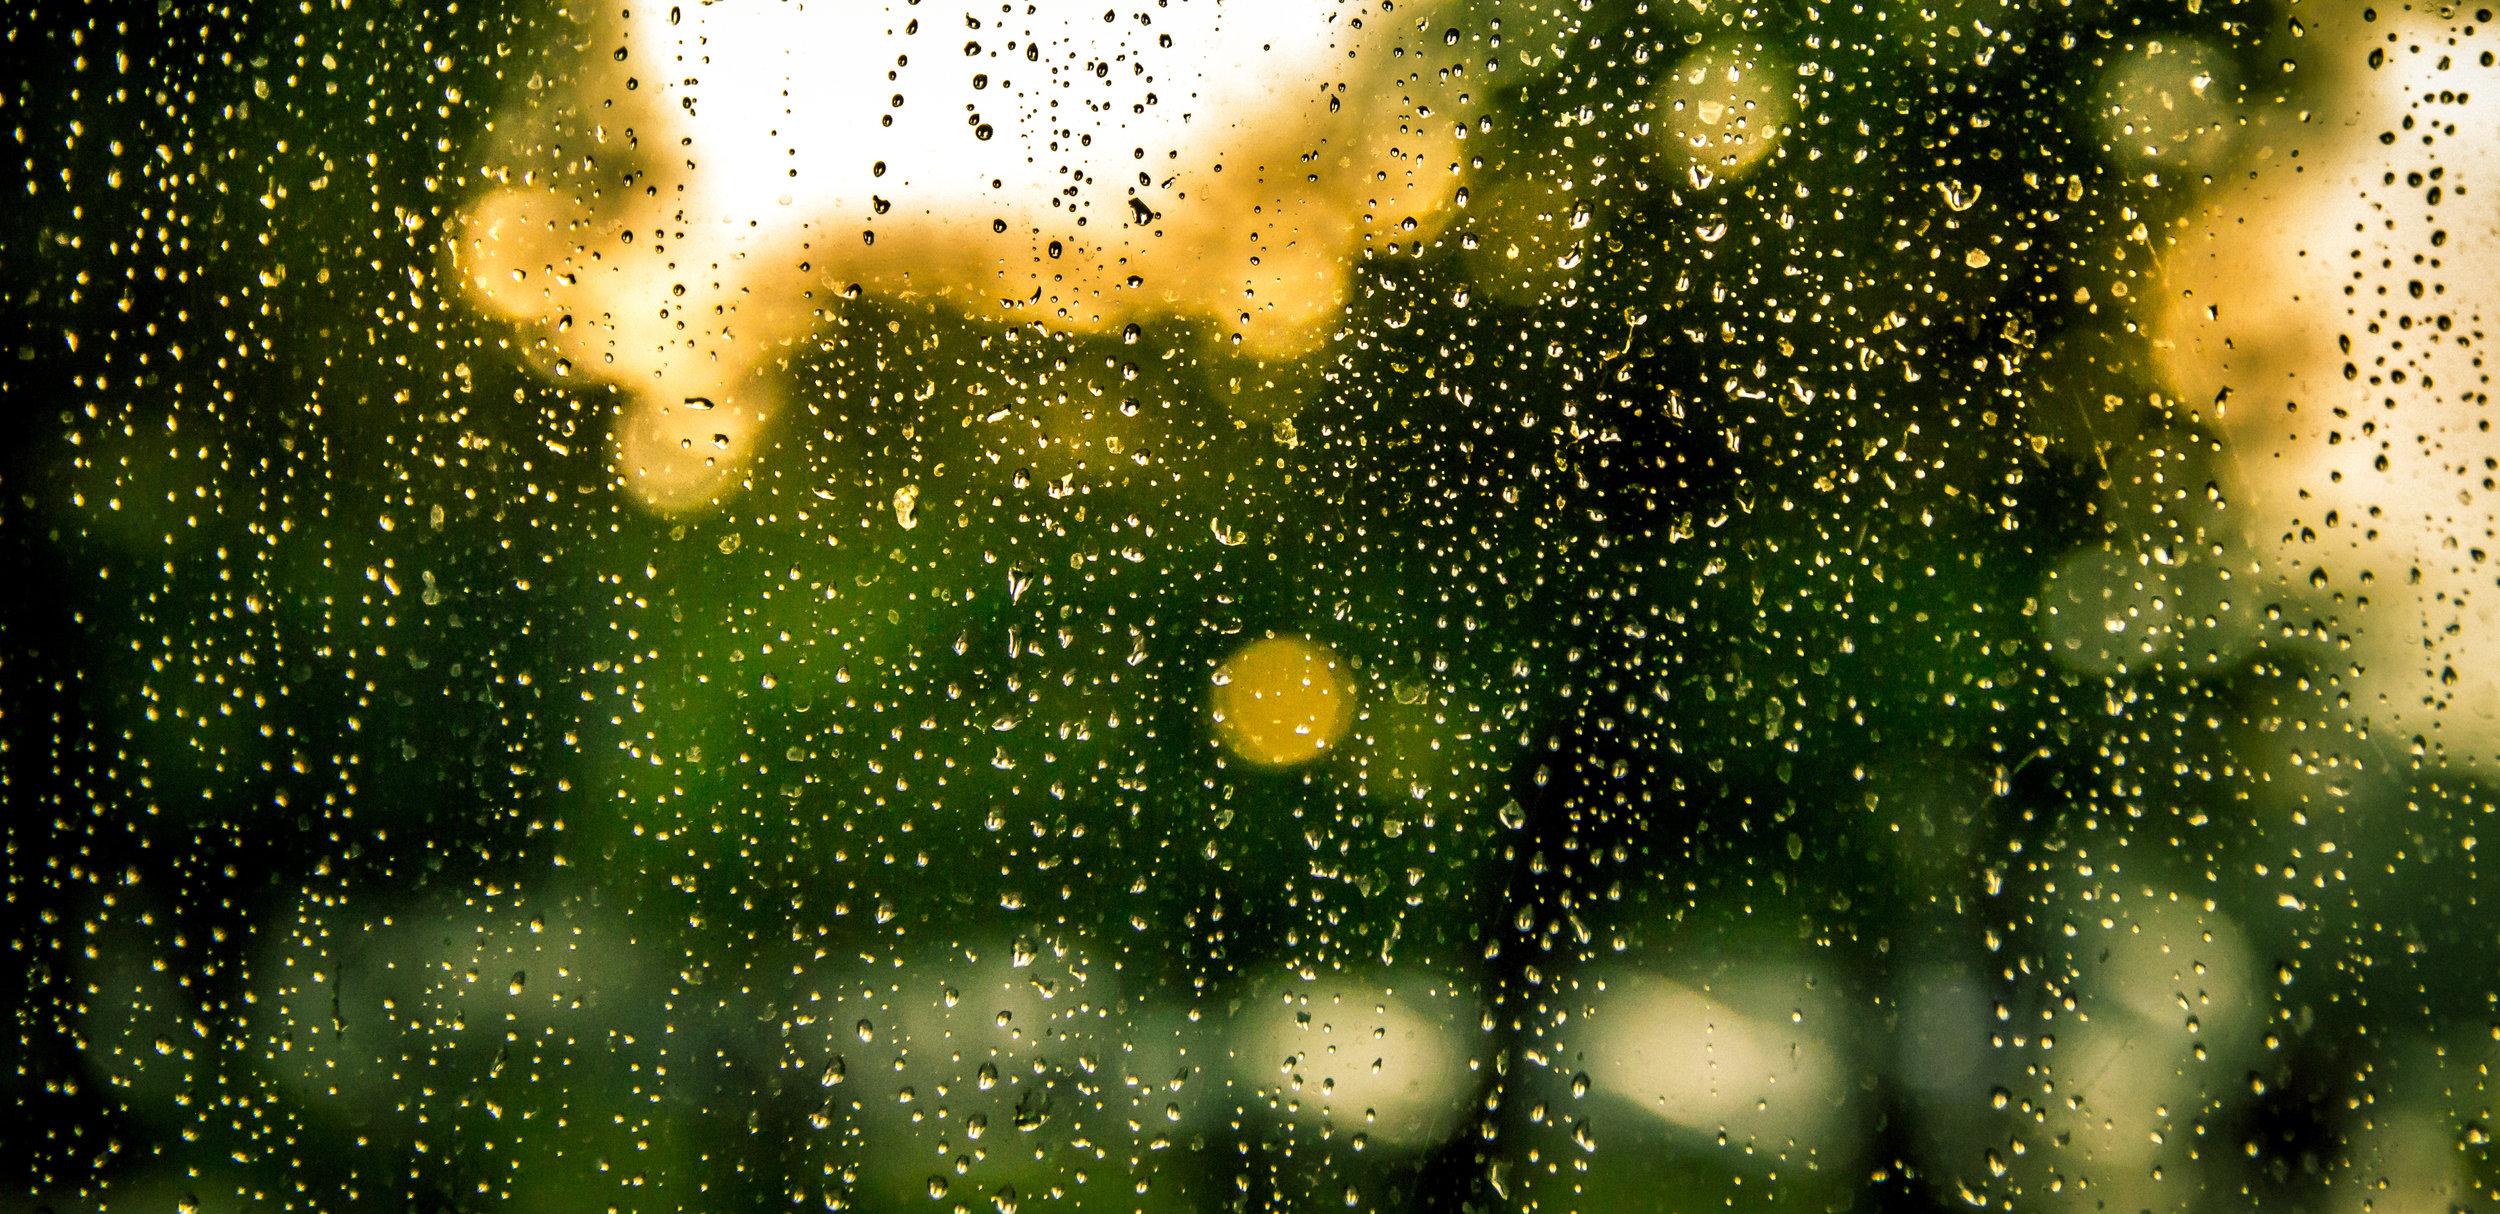 rain-back-up-plan.jpg